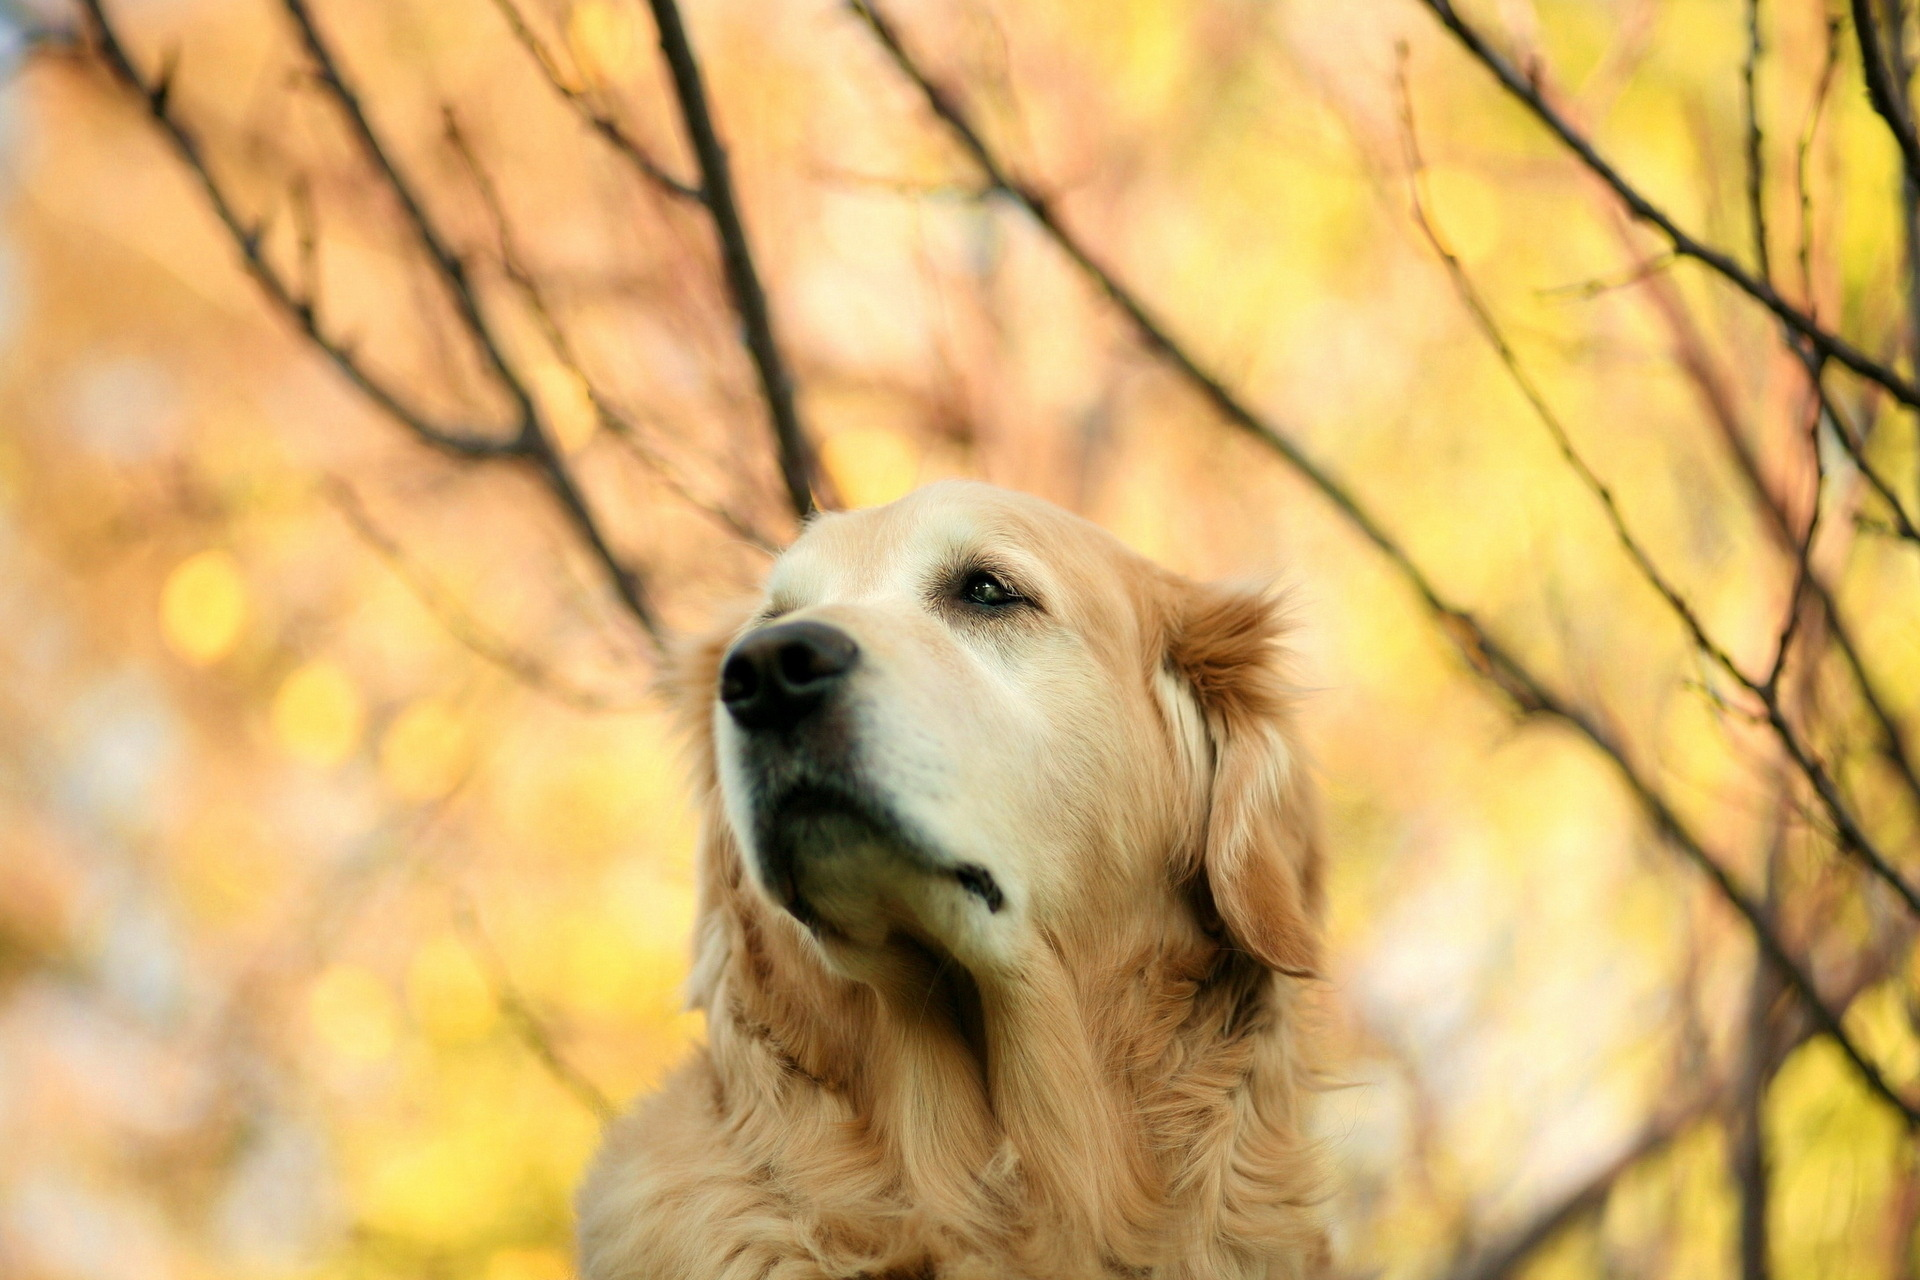 собака животное природа  № 690784 бесплатно